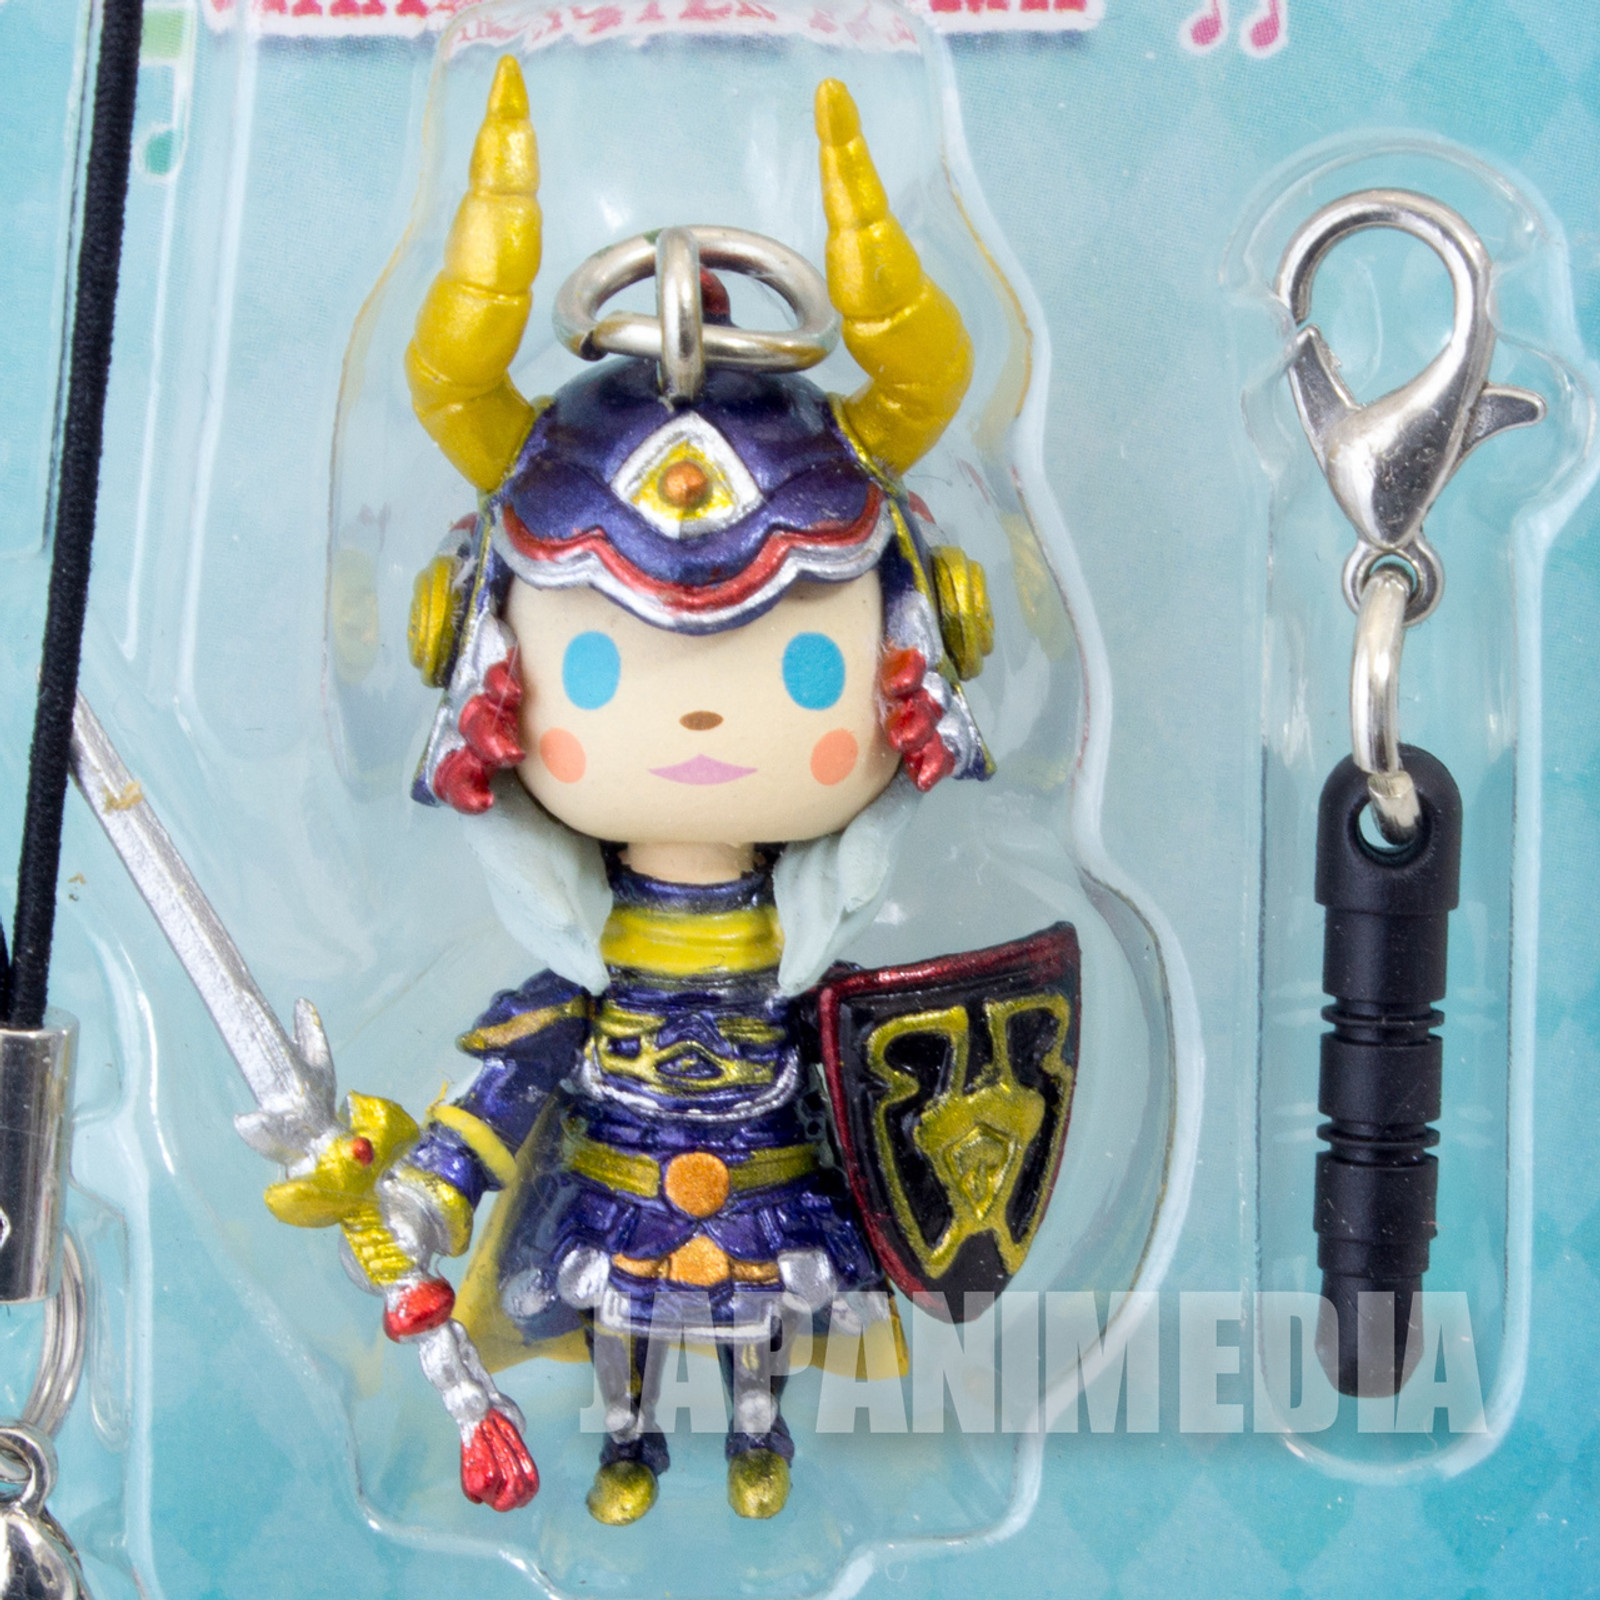 RARE! Final Fantasy Theatrhythm Character Figure Strap Hero of Light SQUARE ENIX